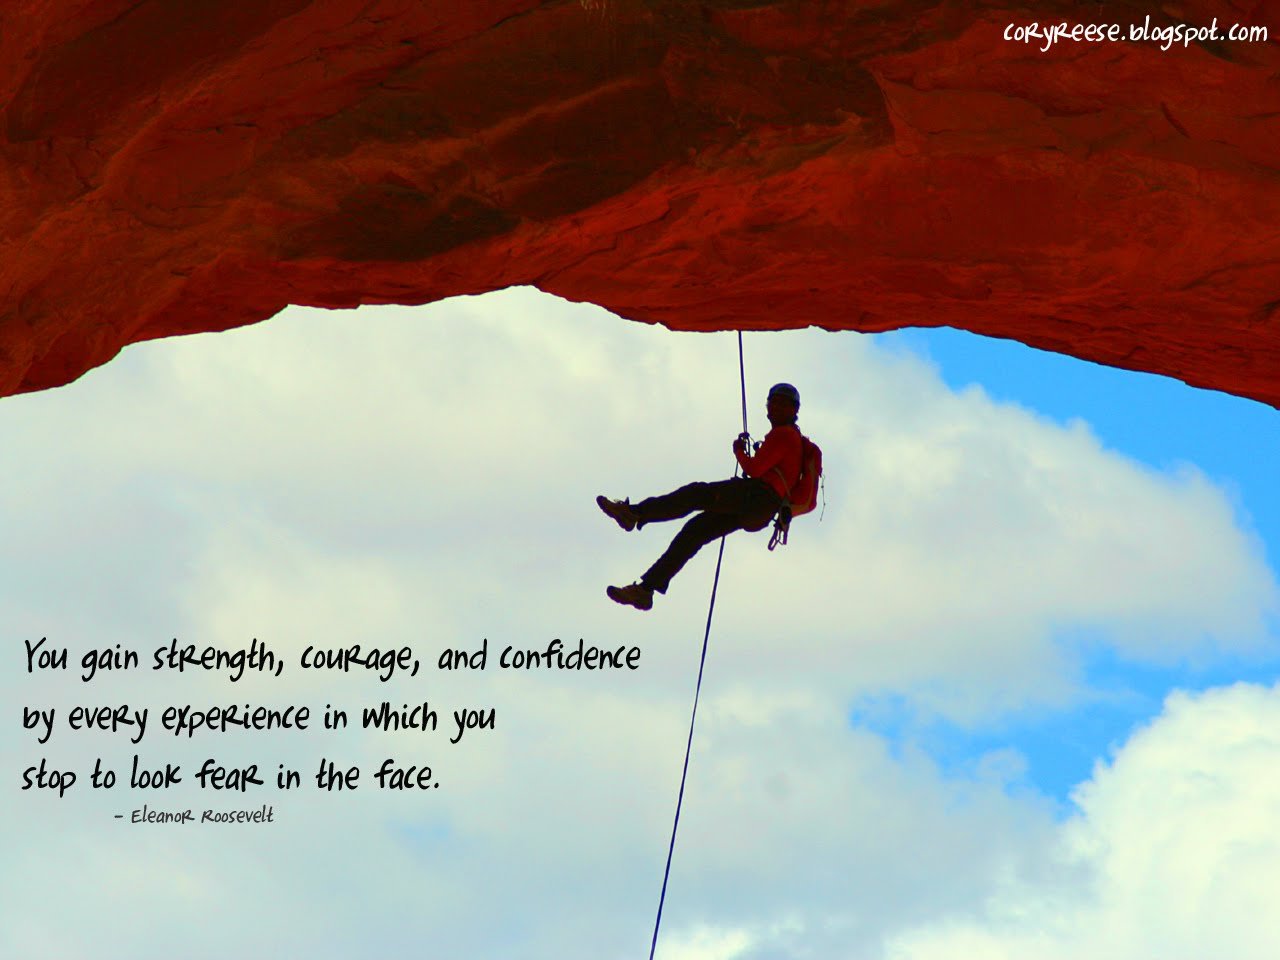 http://3.bp.blogspot.com/_BTA6c77j3cc/TNIIMkKgH8I/AAAAAAAABww/JakYdRips1w/s1600/strength,+courage,+confidence,+fear.jpg